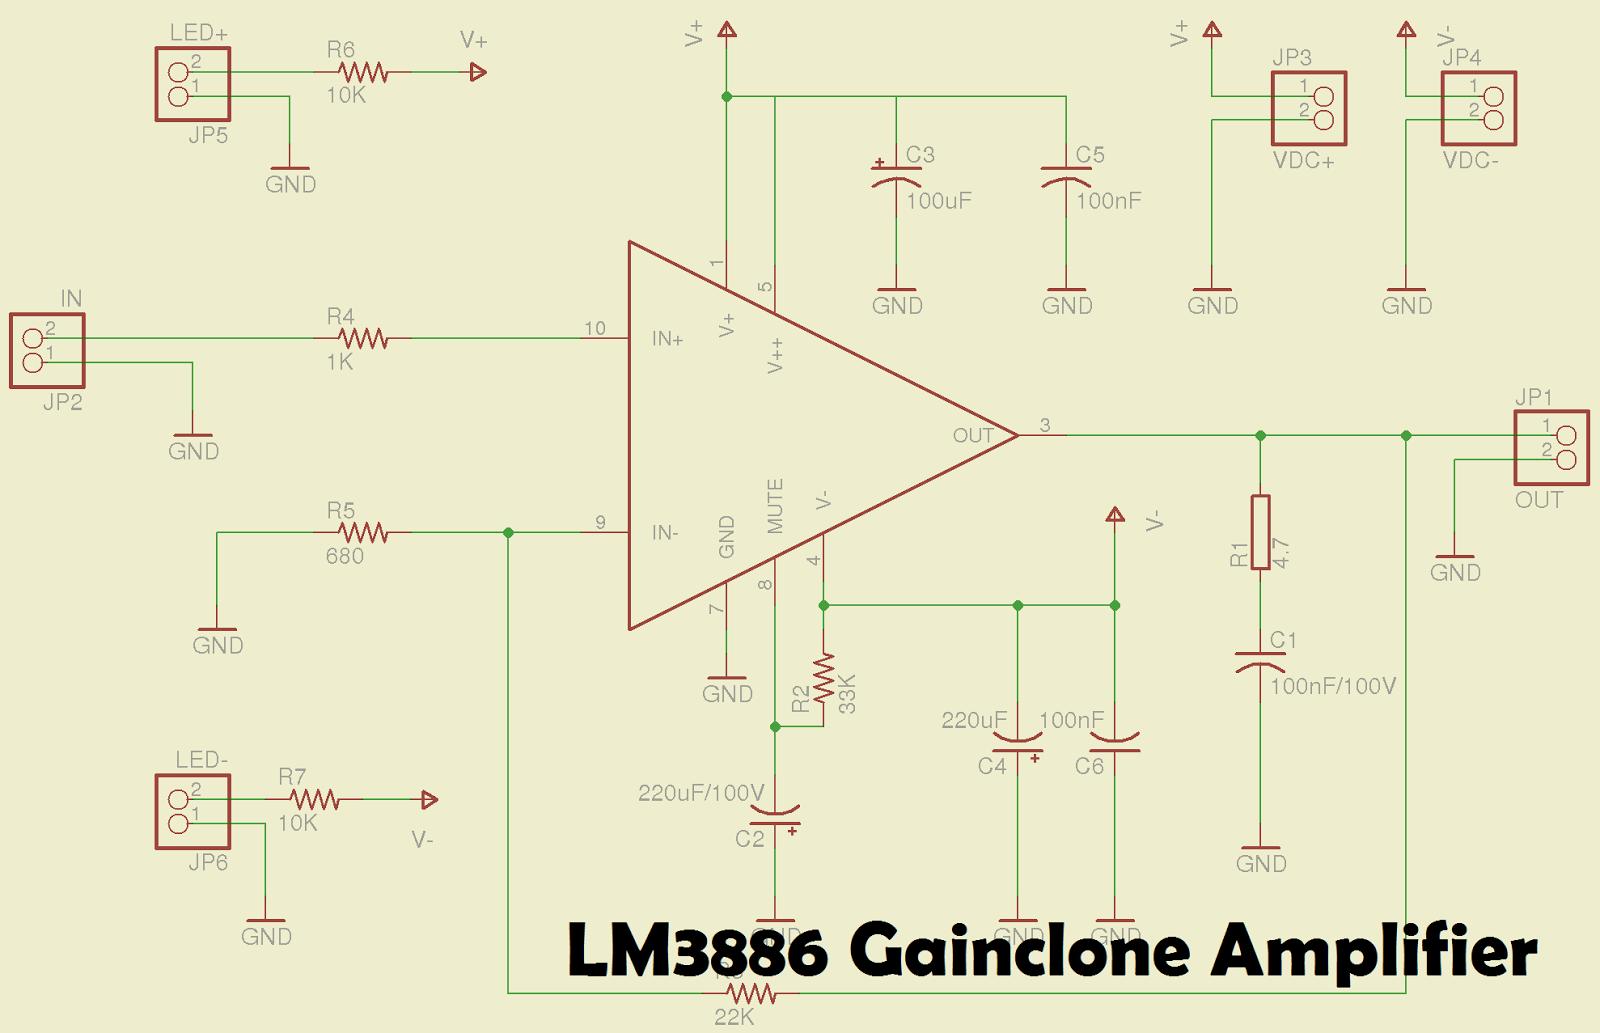 lm3886 gainclone power amplifier [ 1600 x 1033 Pixel ]